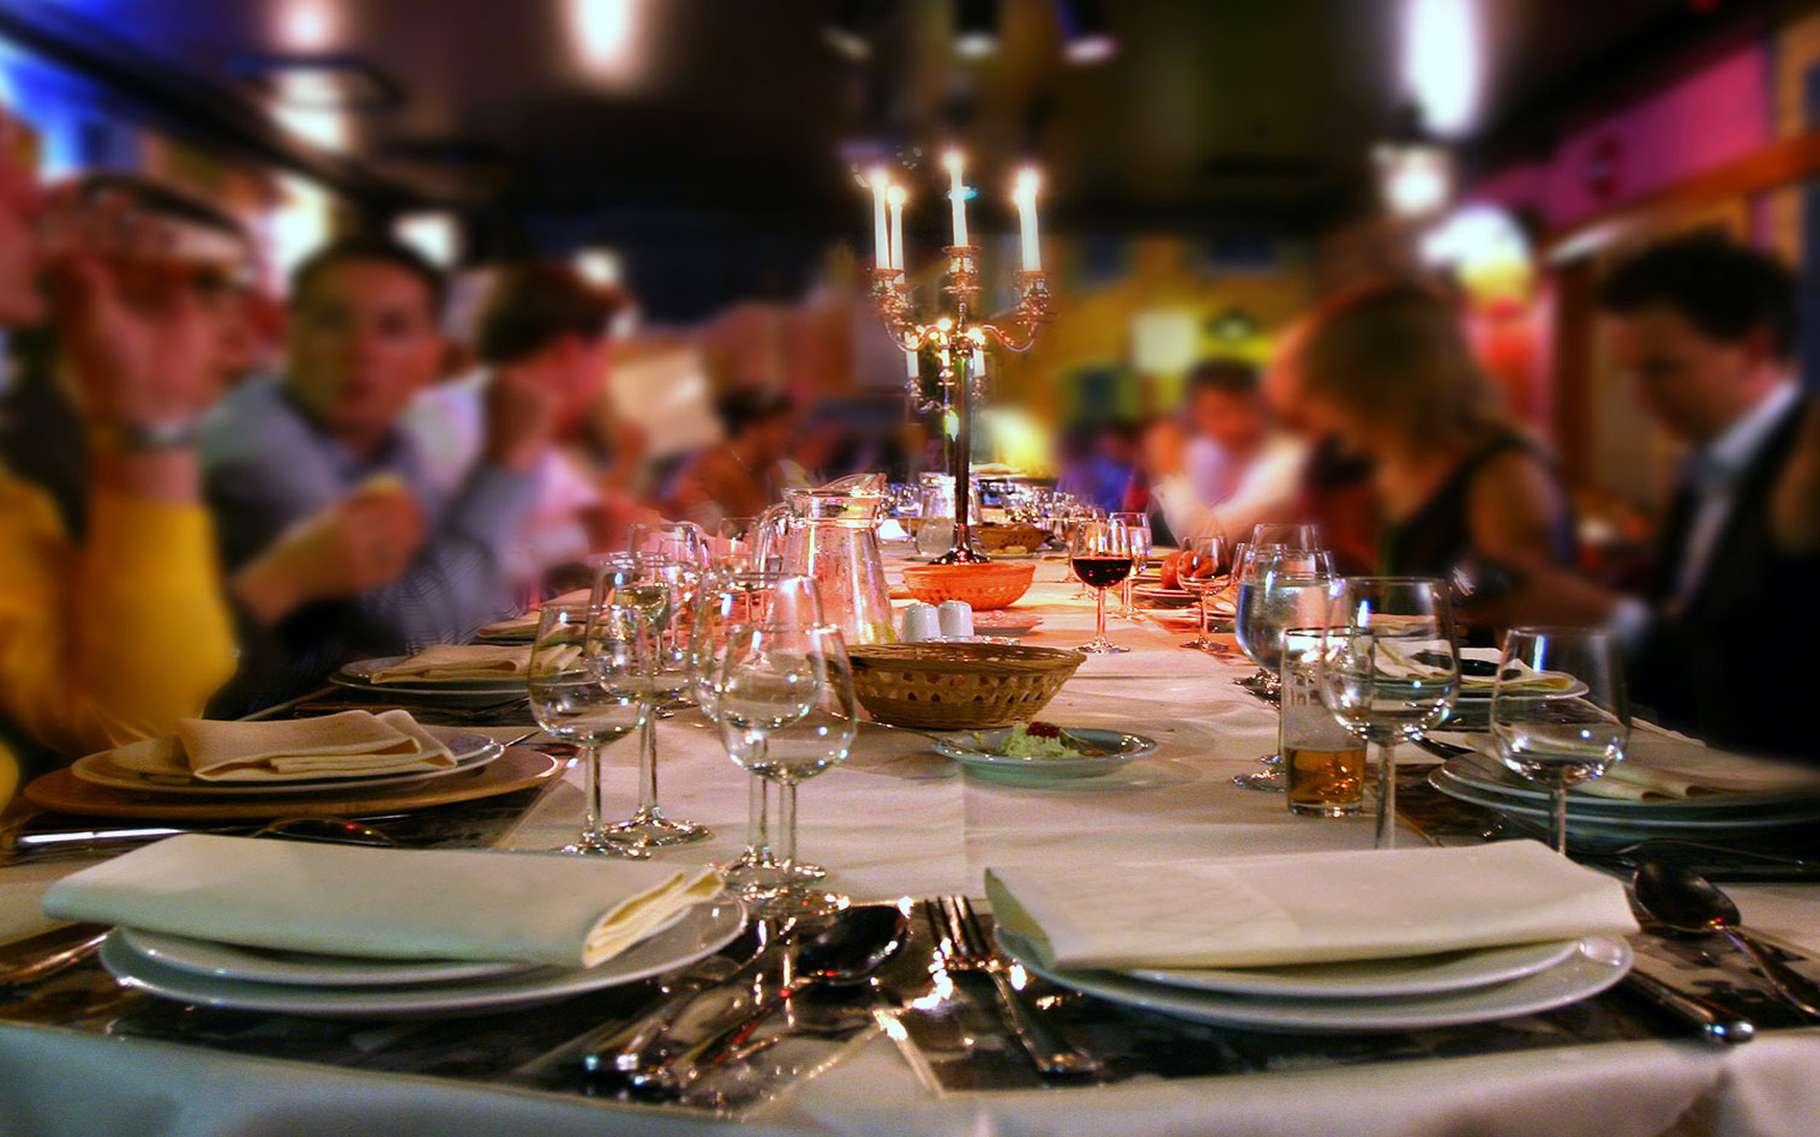 Le dîner de famille. © Alexander, Fotolia